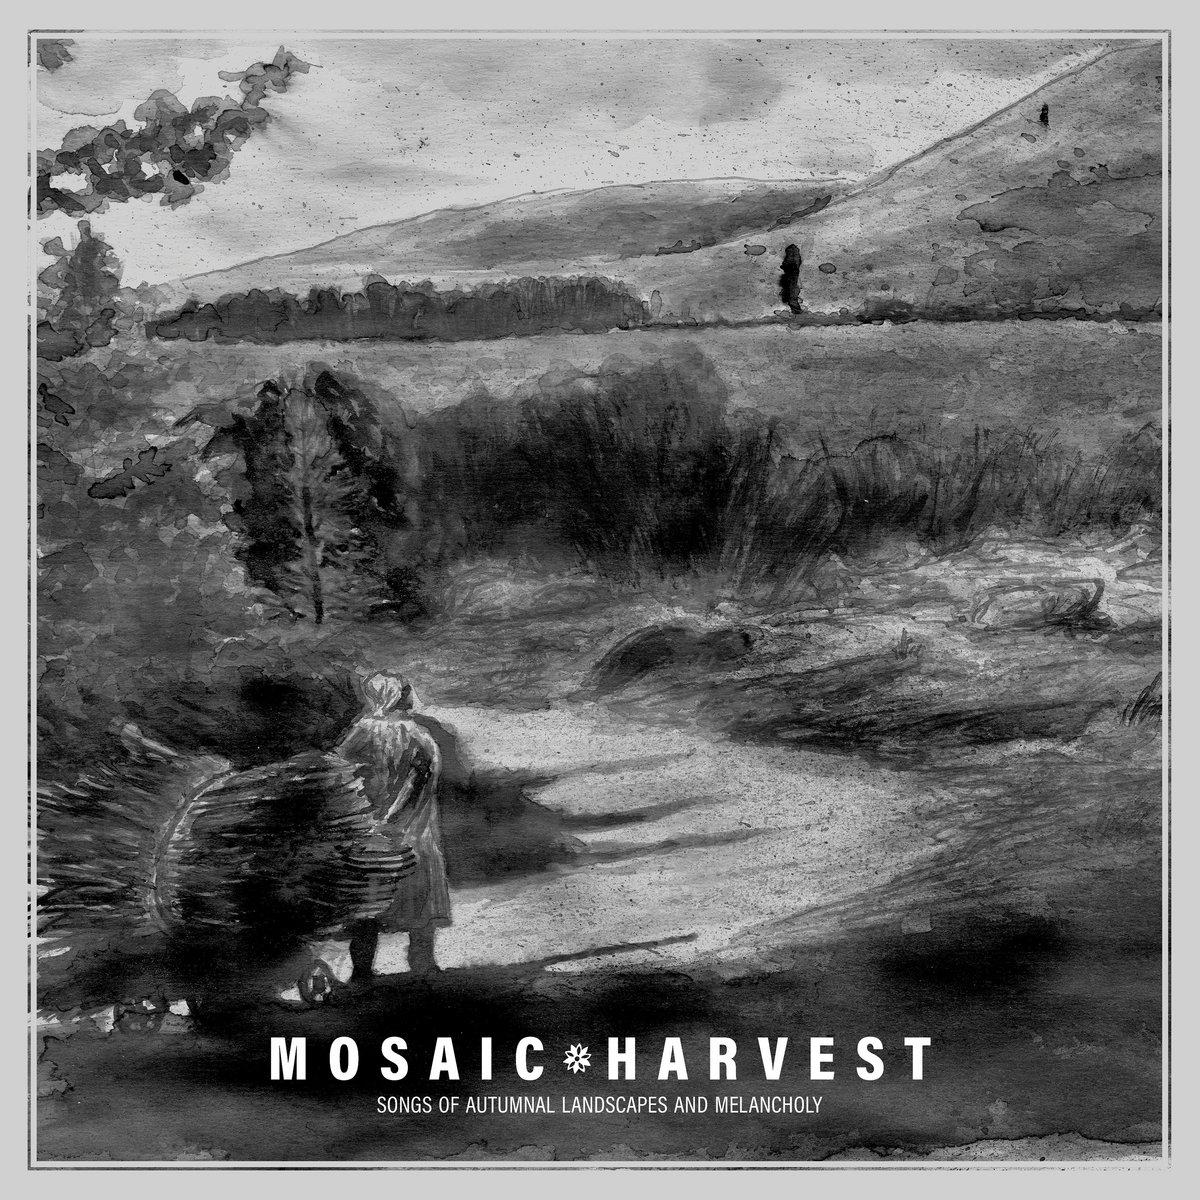 mosaic harvest